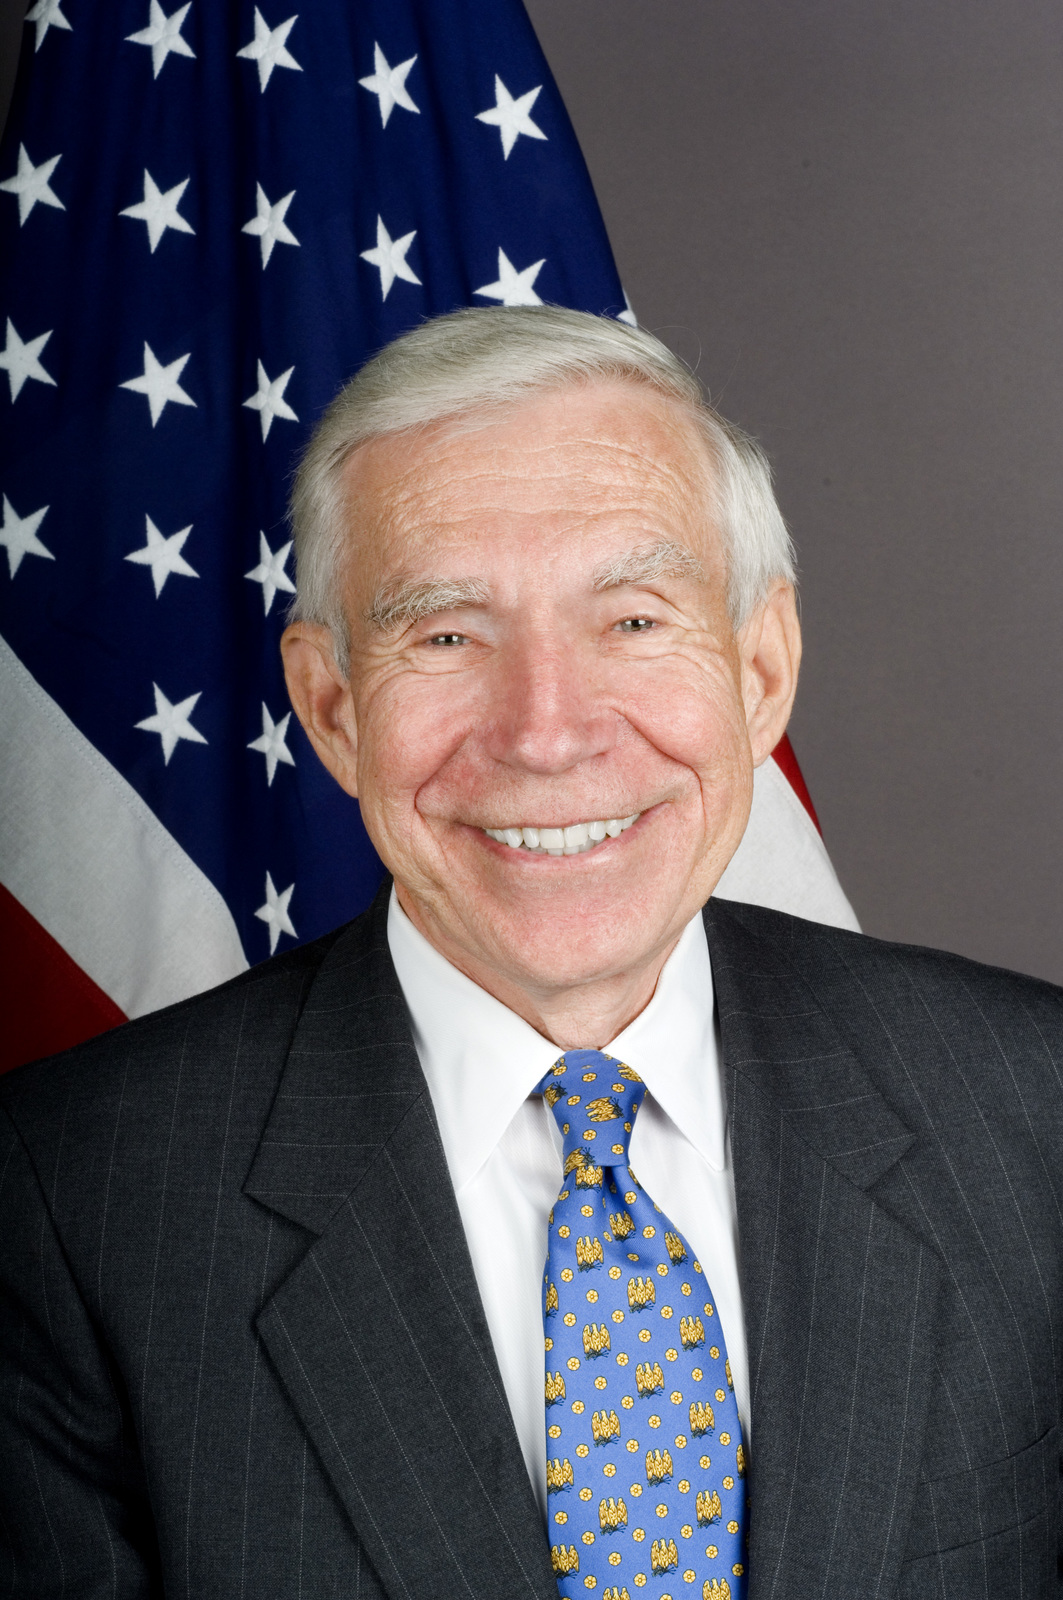 [Assignment: 59-CF-DS-31095-06] Official portrait of Frank Baxter, U.S. Ambassador-designate to Uruguay [Photographer: Ann Thomas--State] [59-CF-DS-31095-06_Frank_Baxter.jpg]